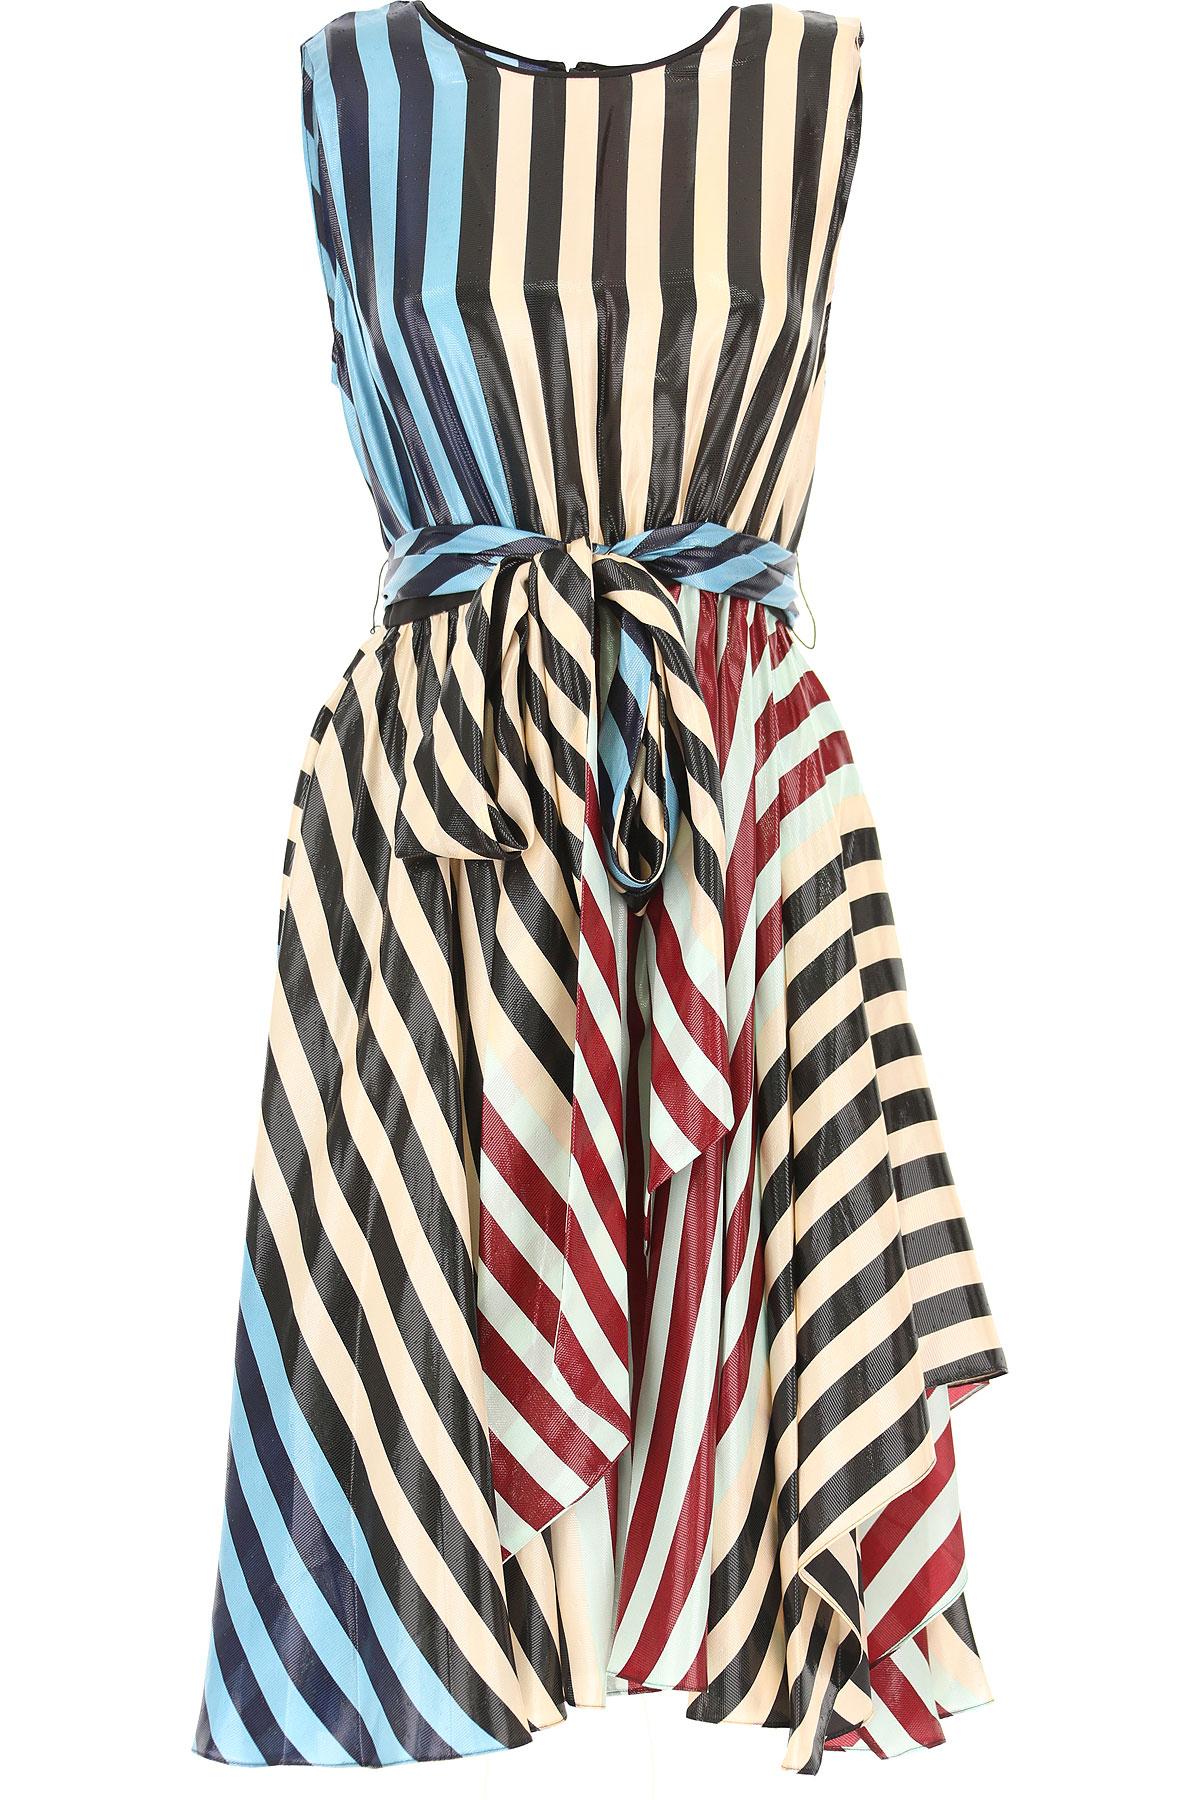 Image of Diane Von Furstenberg Dress for Women, Evening Cocktail Party, Pink, Silk, 2017, USA 2 - IT 38 USA 4 - IT 40 USA 6 - IT 42 USA 8 - IT 44 USA 10 - IT 46